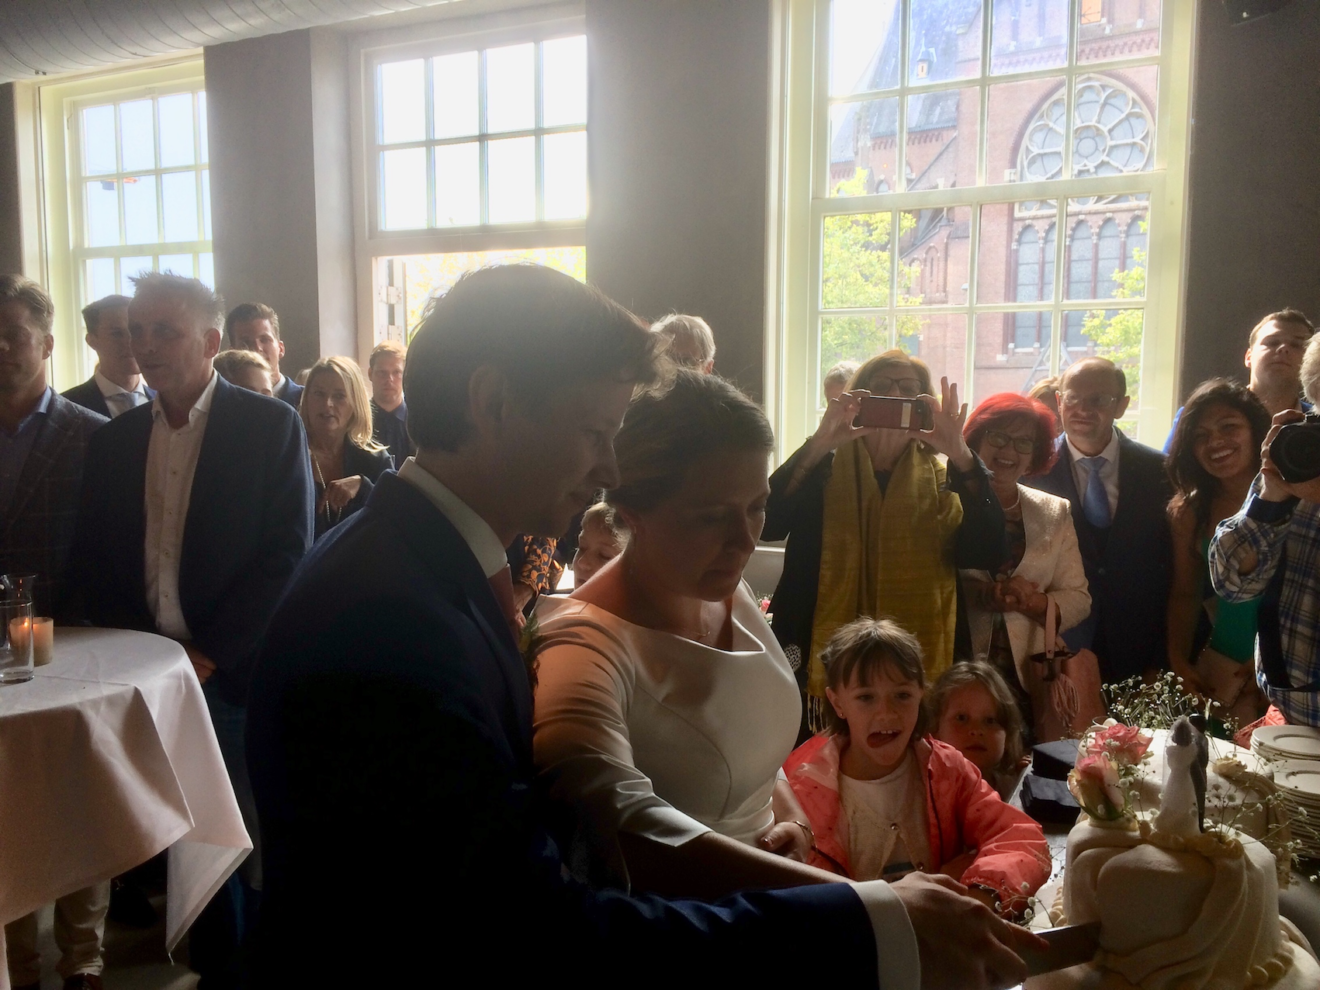 Jan en Iozefina getrouwd!